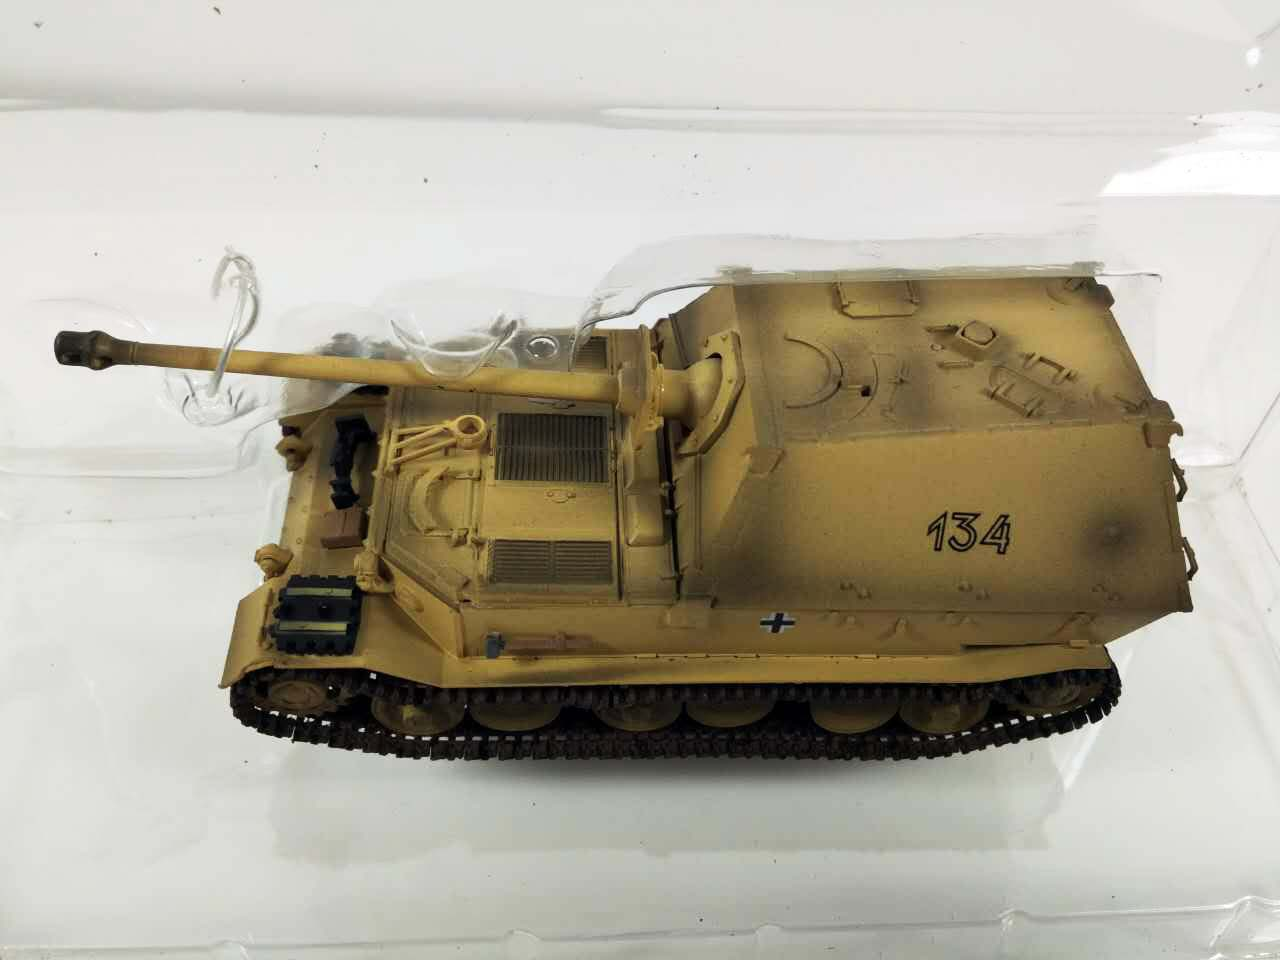 WW2 German Panzerjager Ferdinand tank destroyer 653 Orel 1:72 finish Easy Model